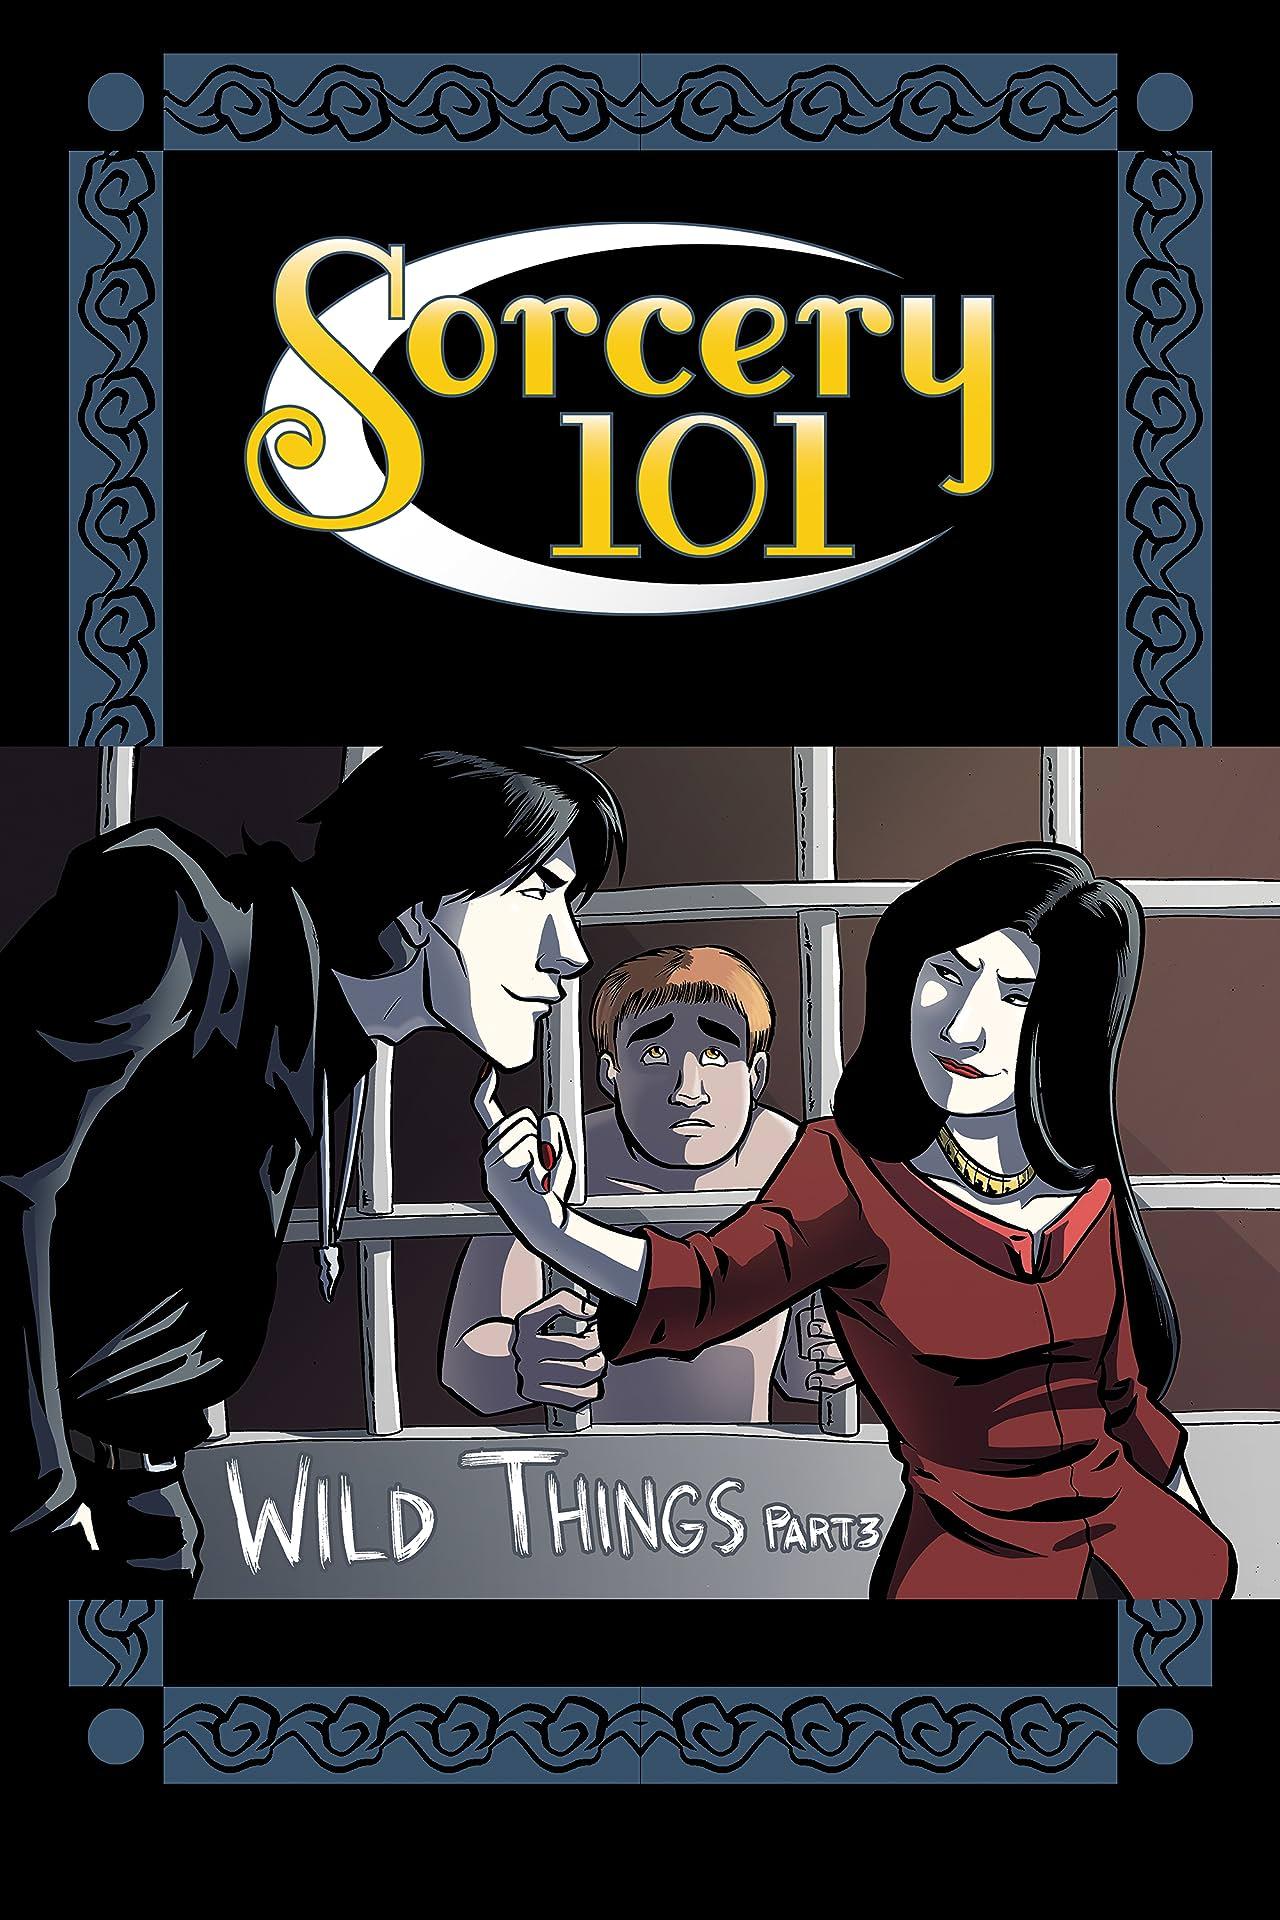 Sorcery 101 #6